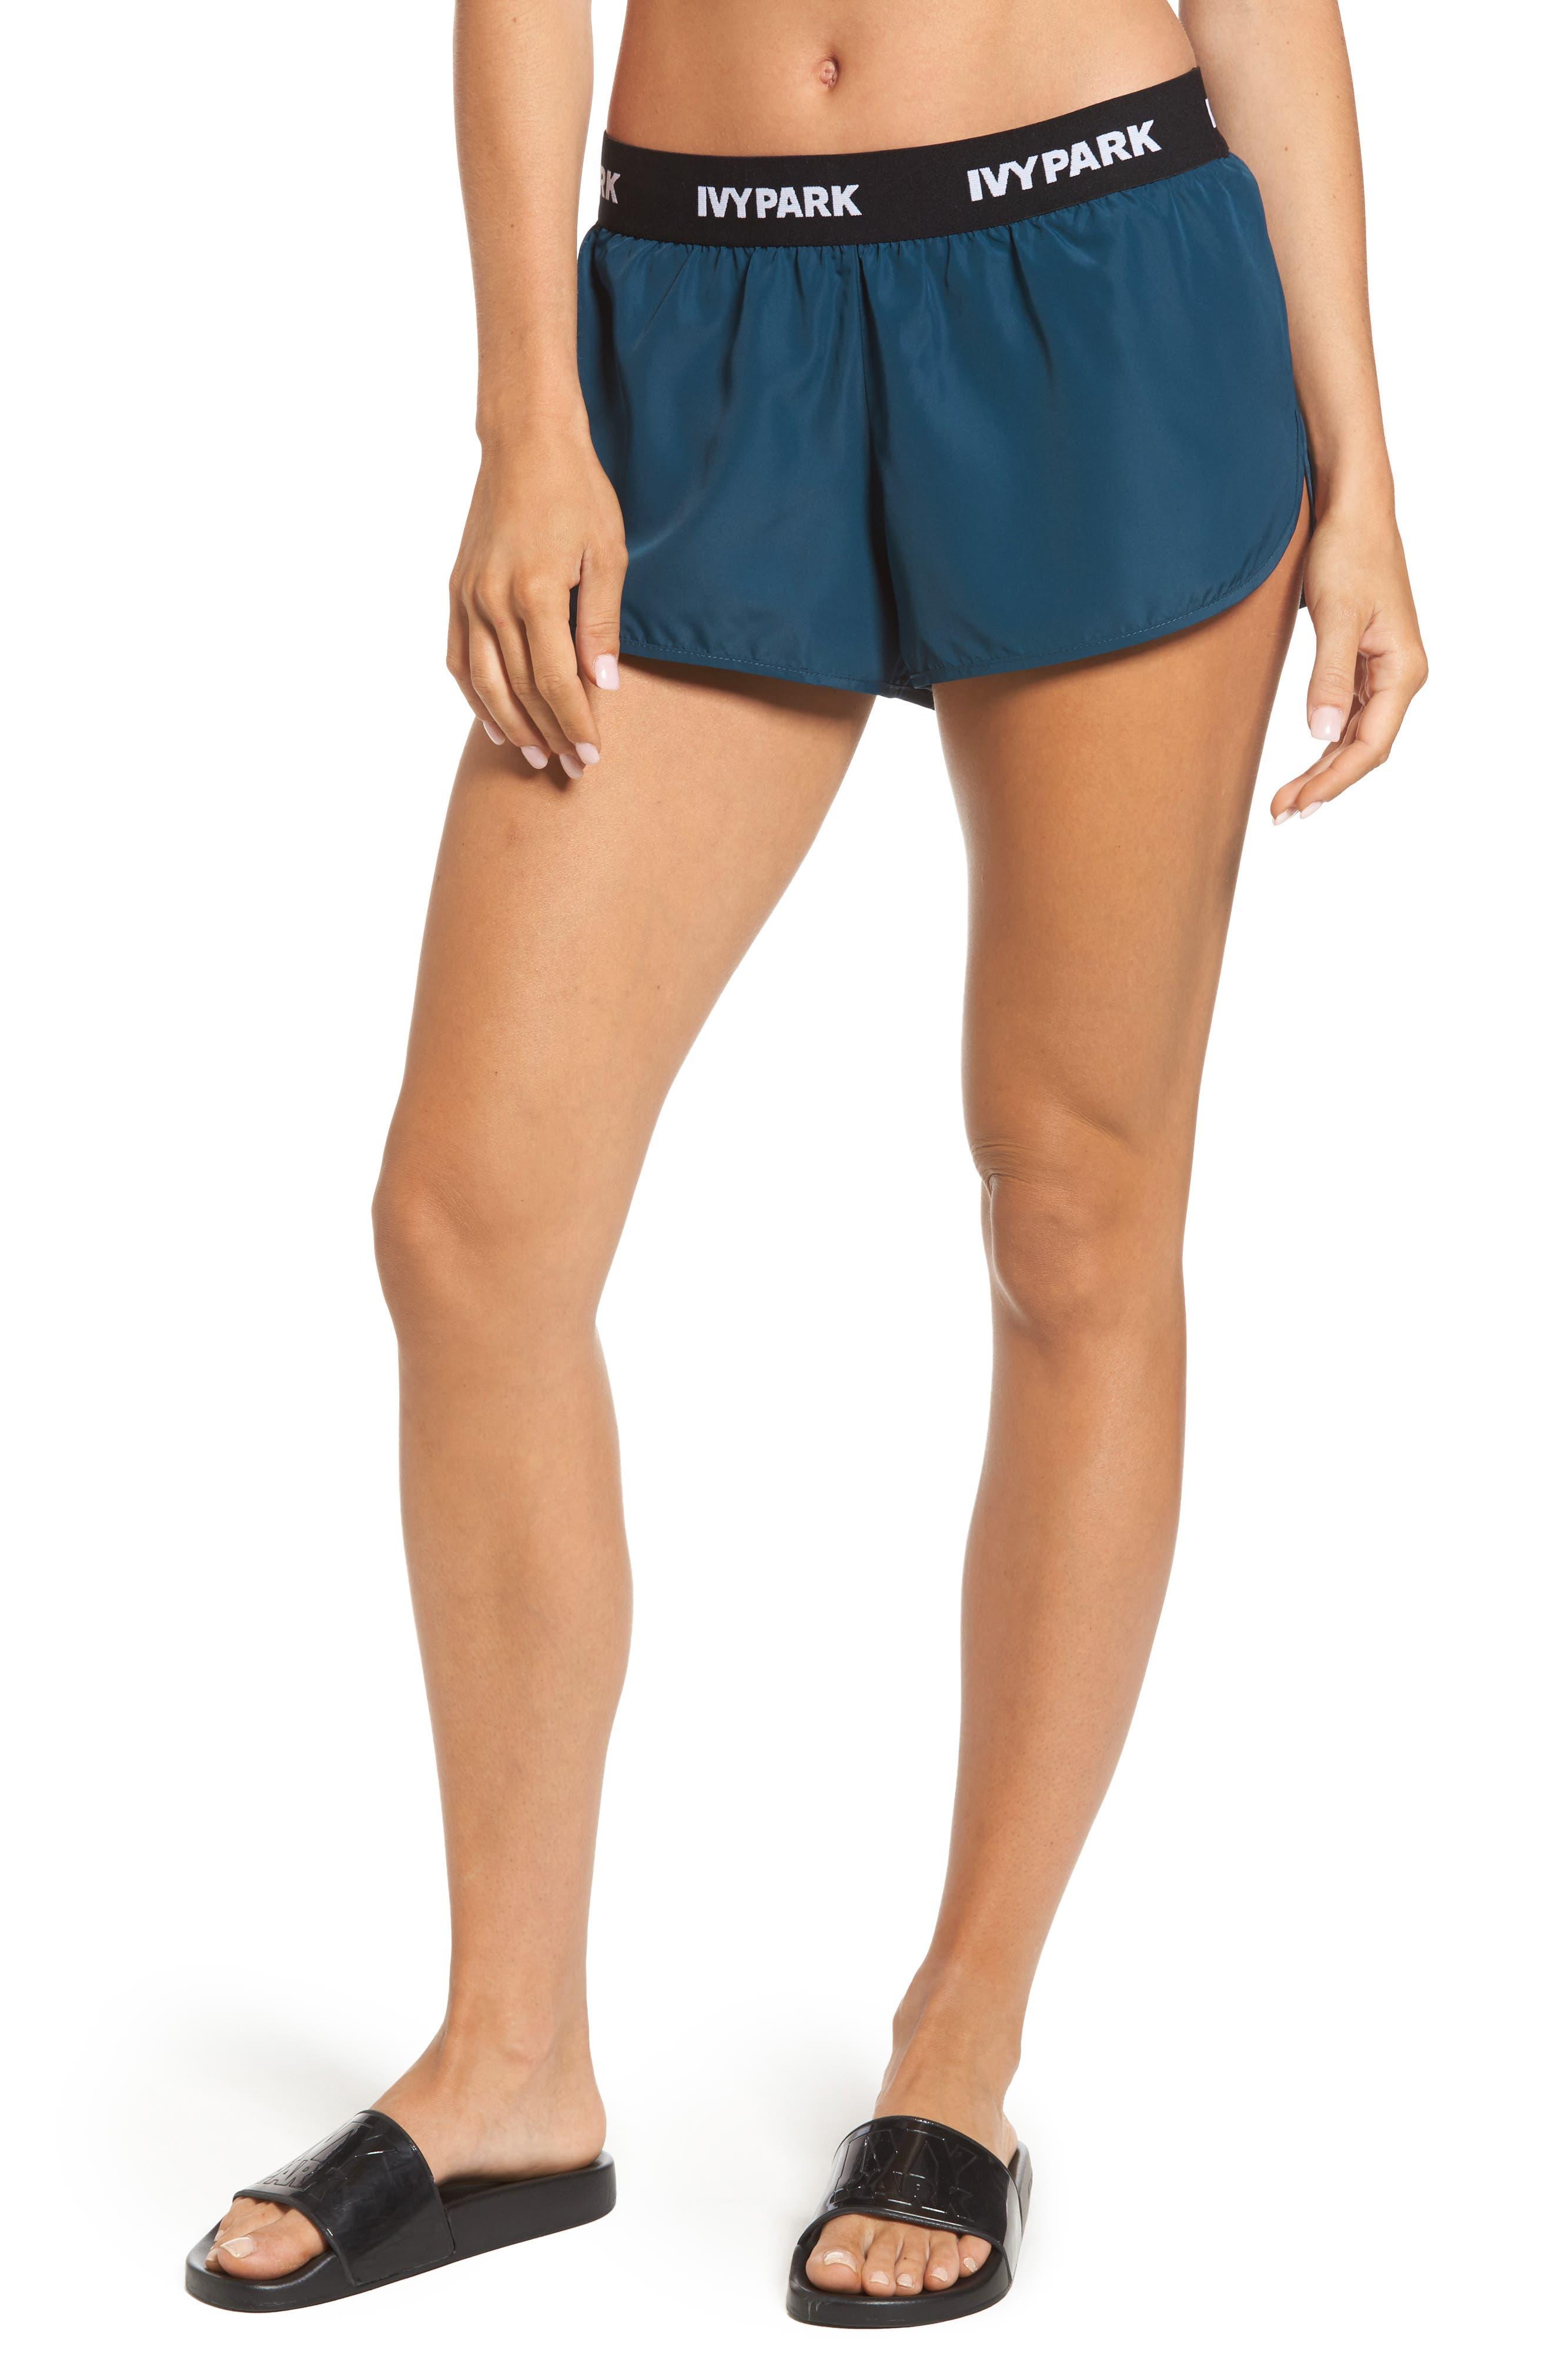 IVY PARK® Logo Elastic Runner Shorts